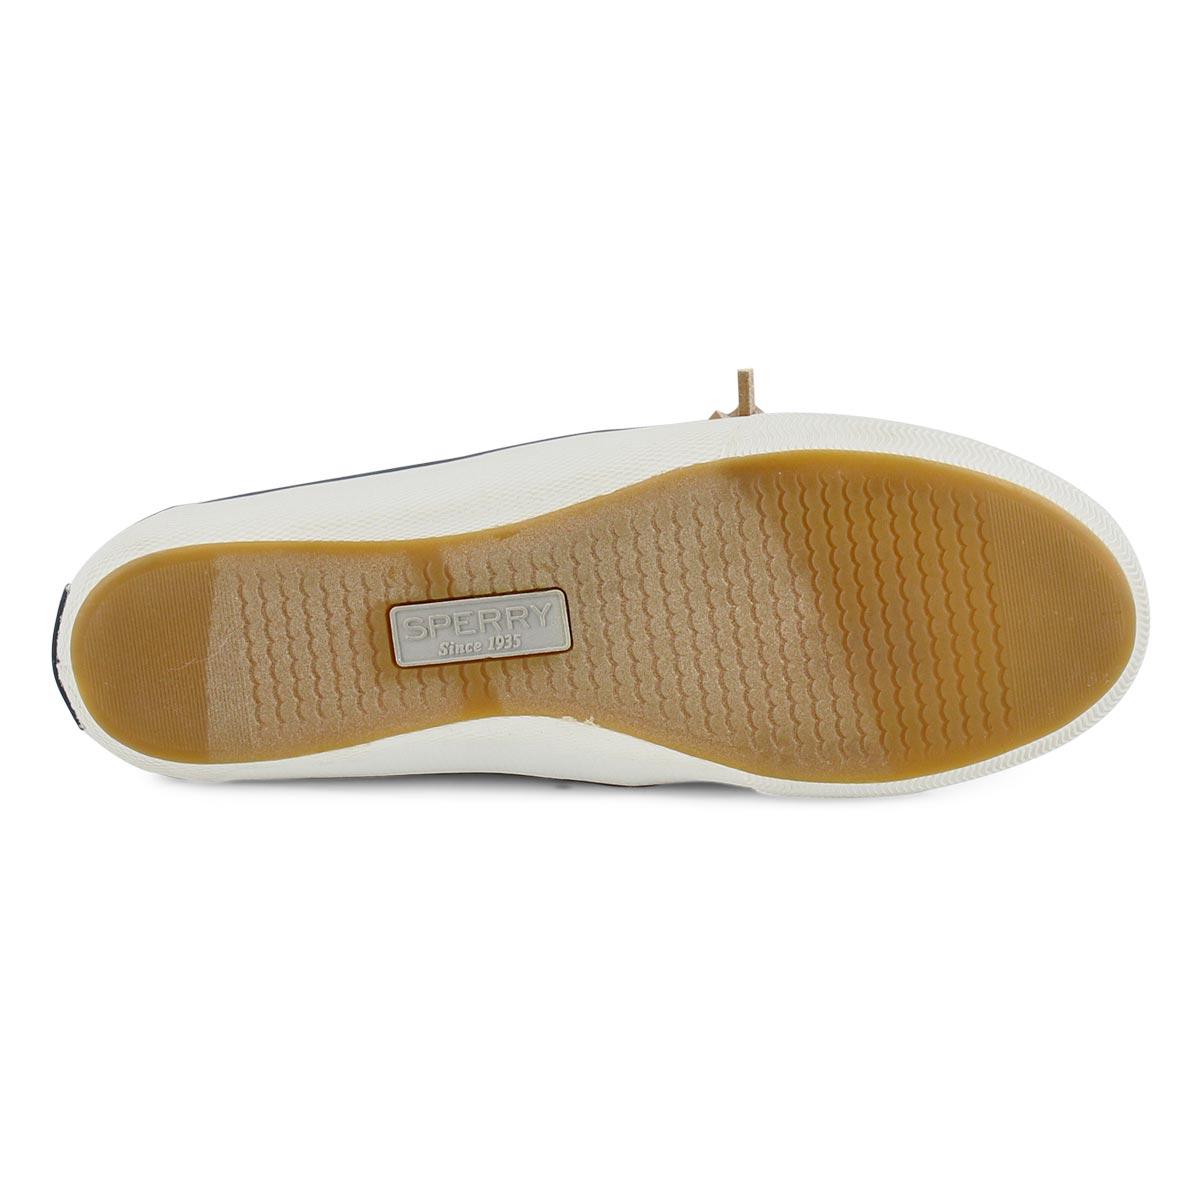 Lds Lounge Away grey boat shoe